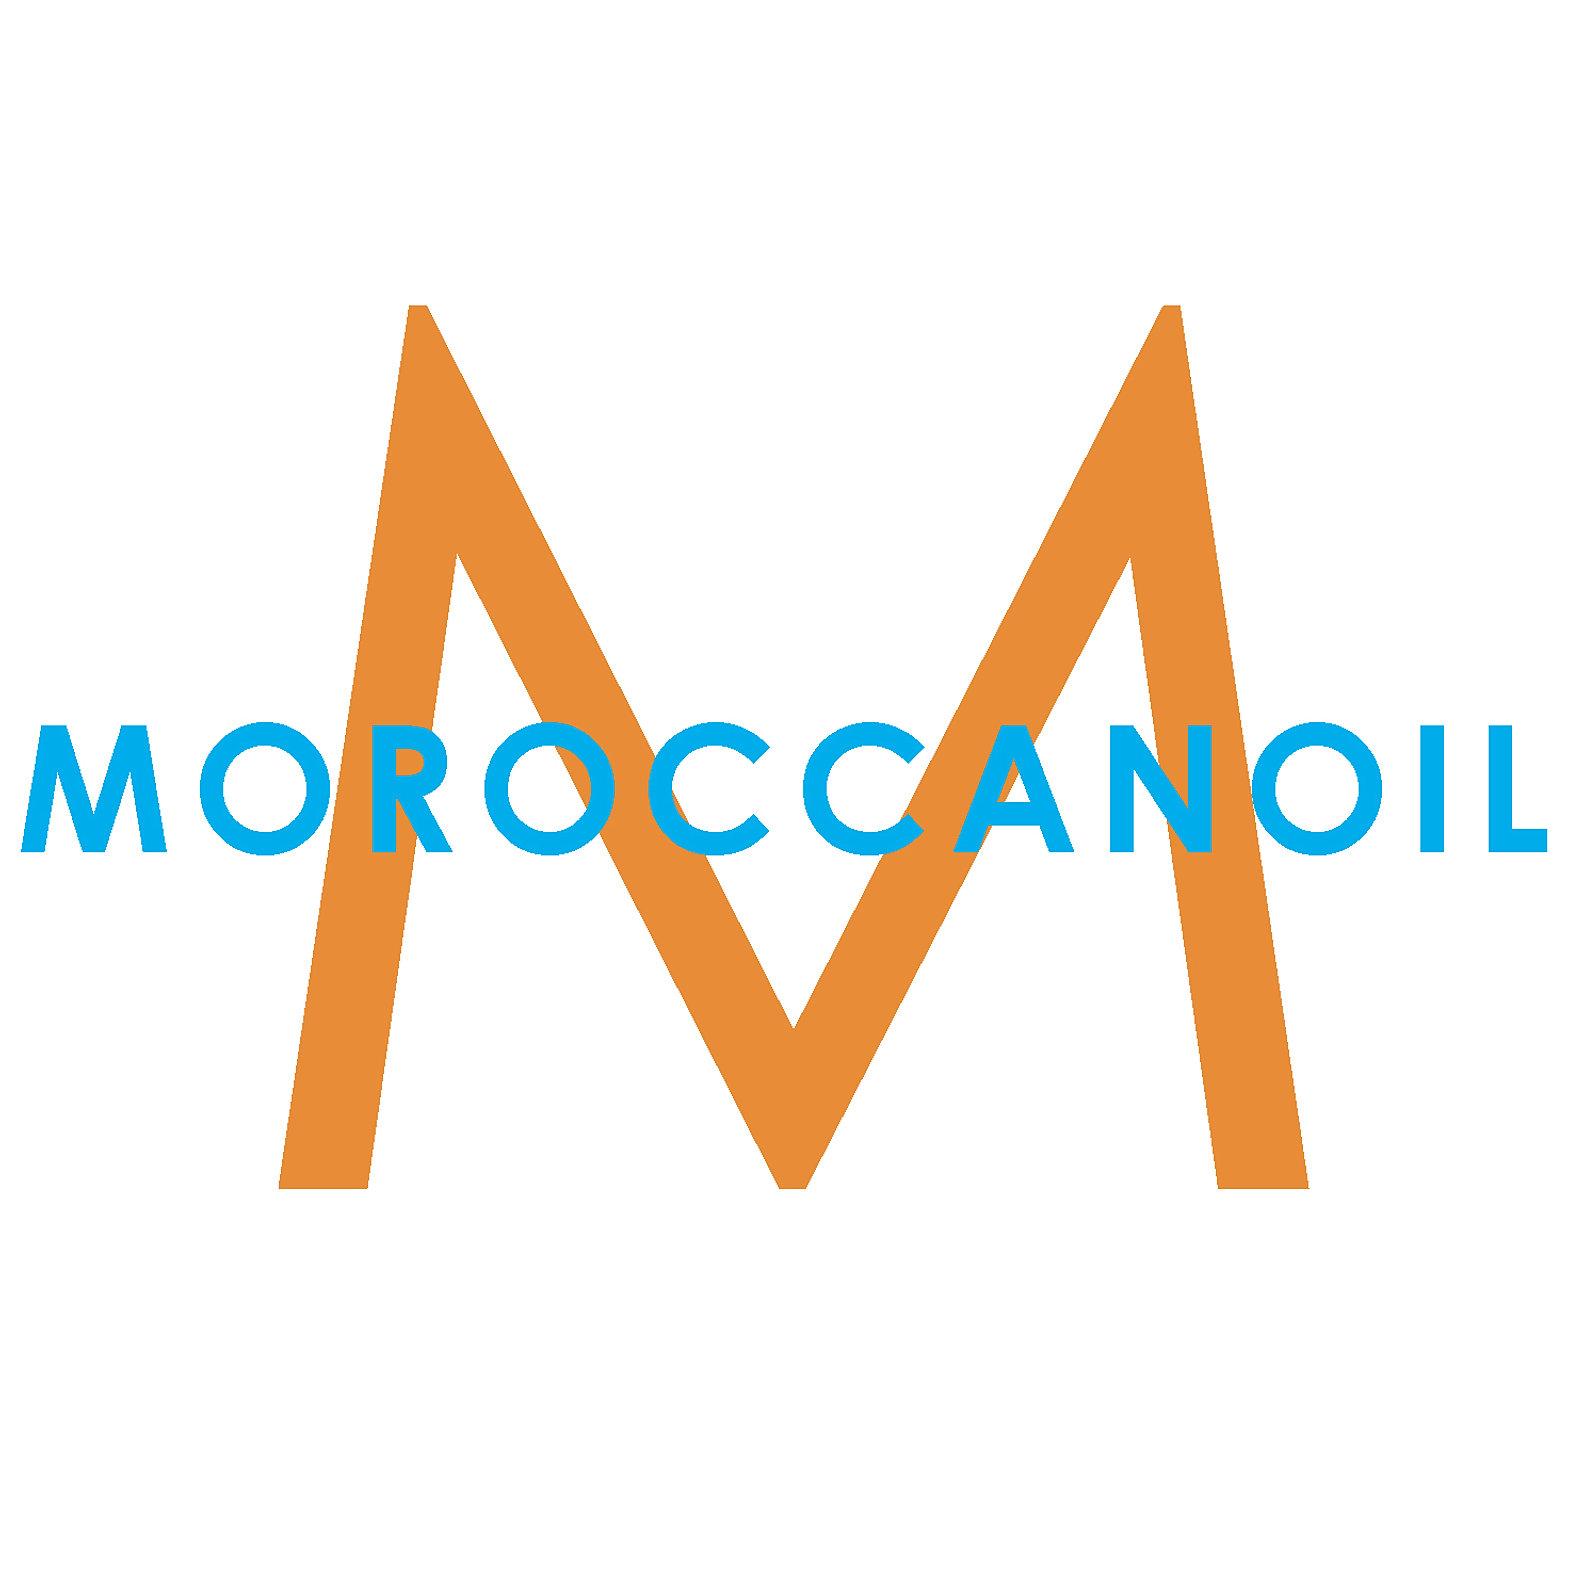 Curly hair seattle tacoma vasuda salon morocan oil full logo nvjuhfo Images